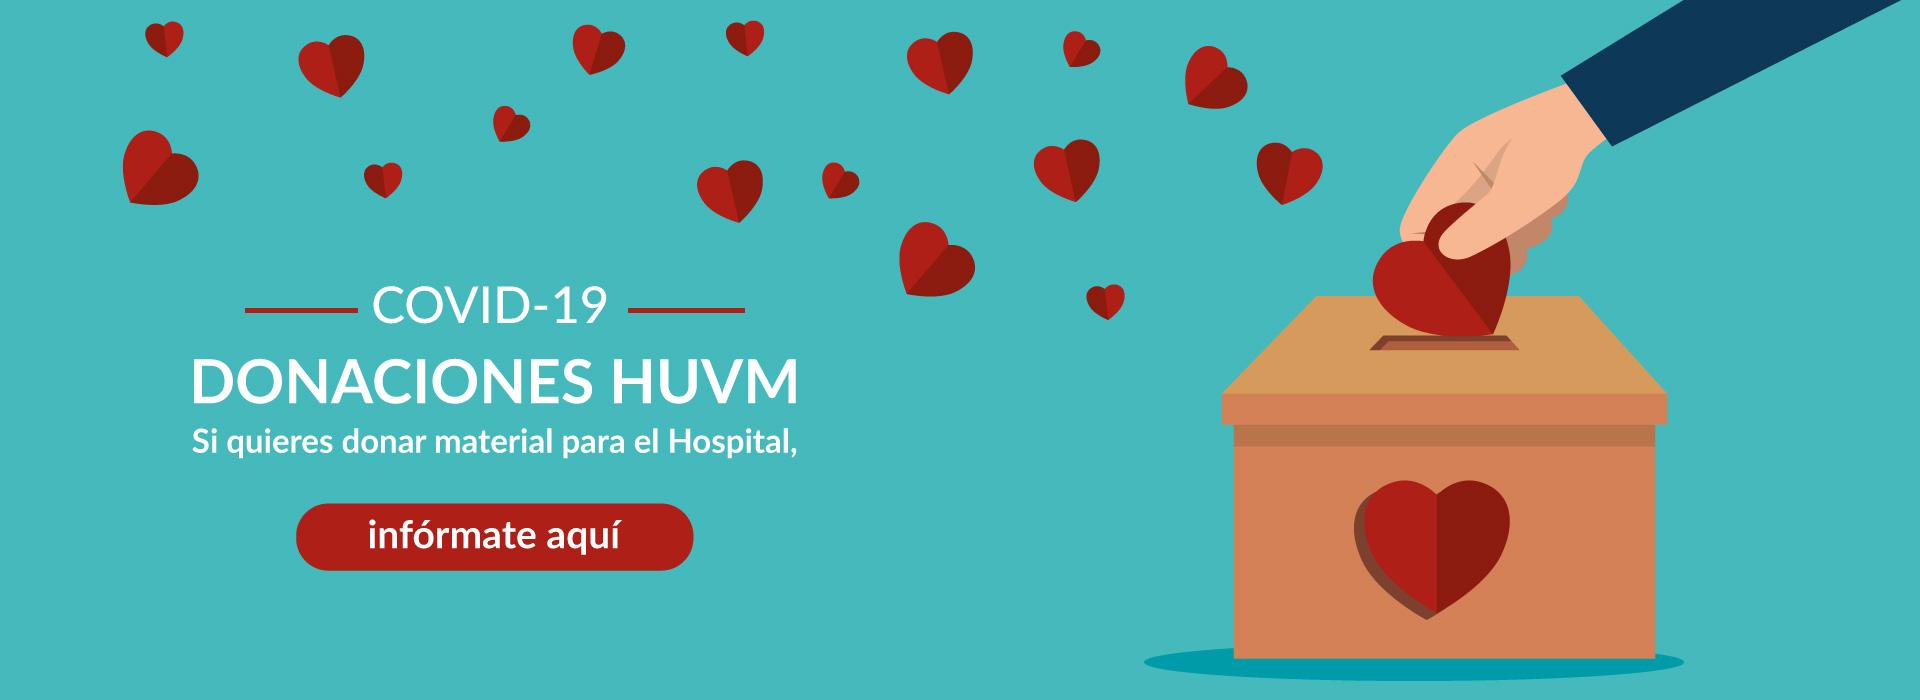 Donaciones-HUVM-COVID-19